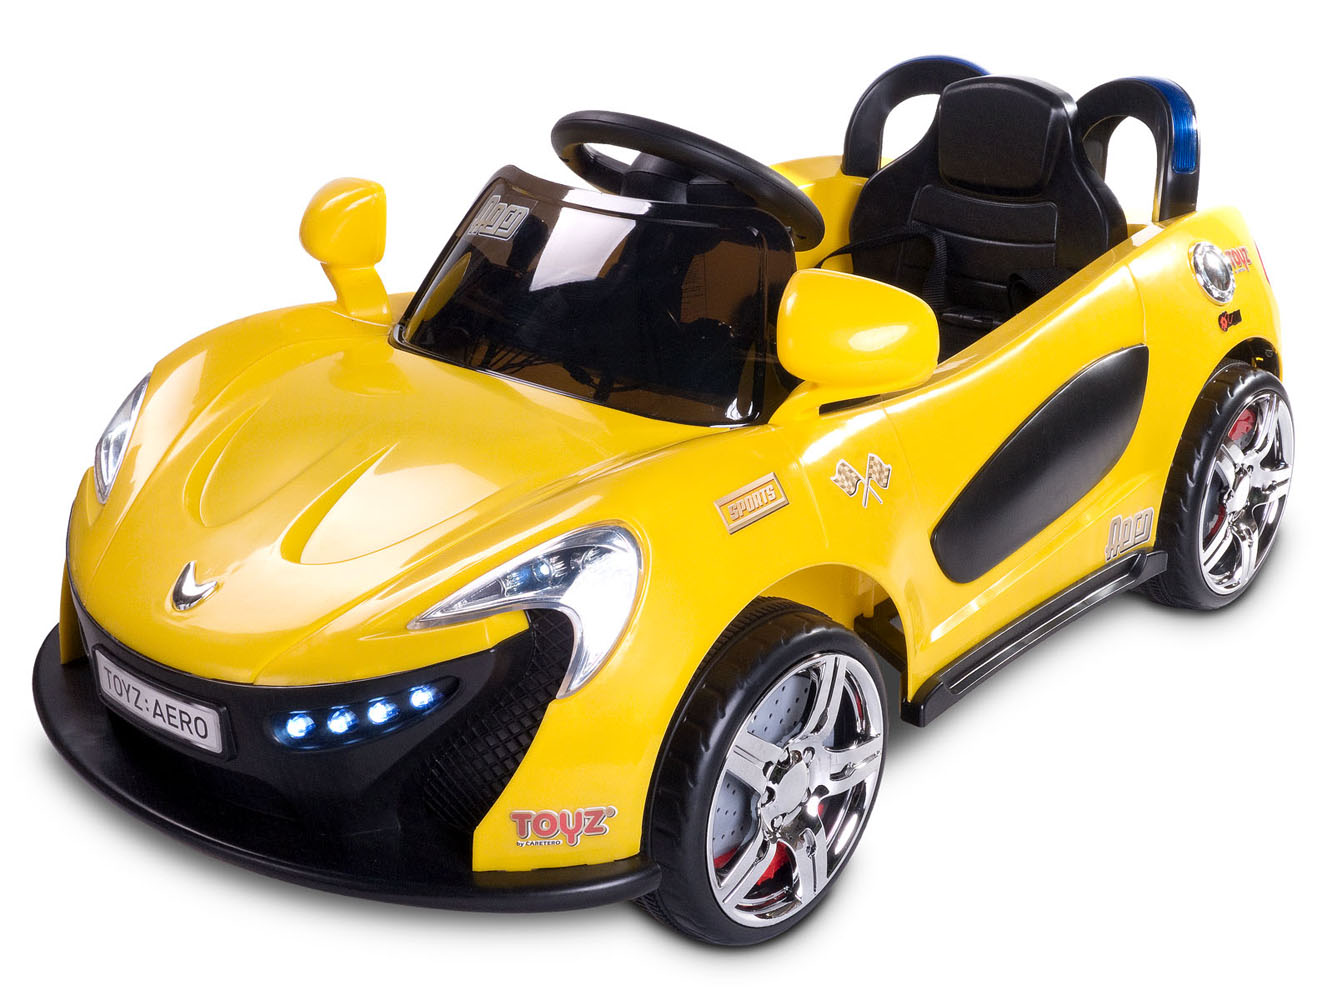 Dětské auto TOYZ Aero yellow na baterii Elektrické autíčko pro děti Toyz